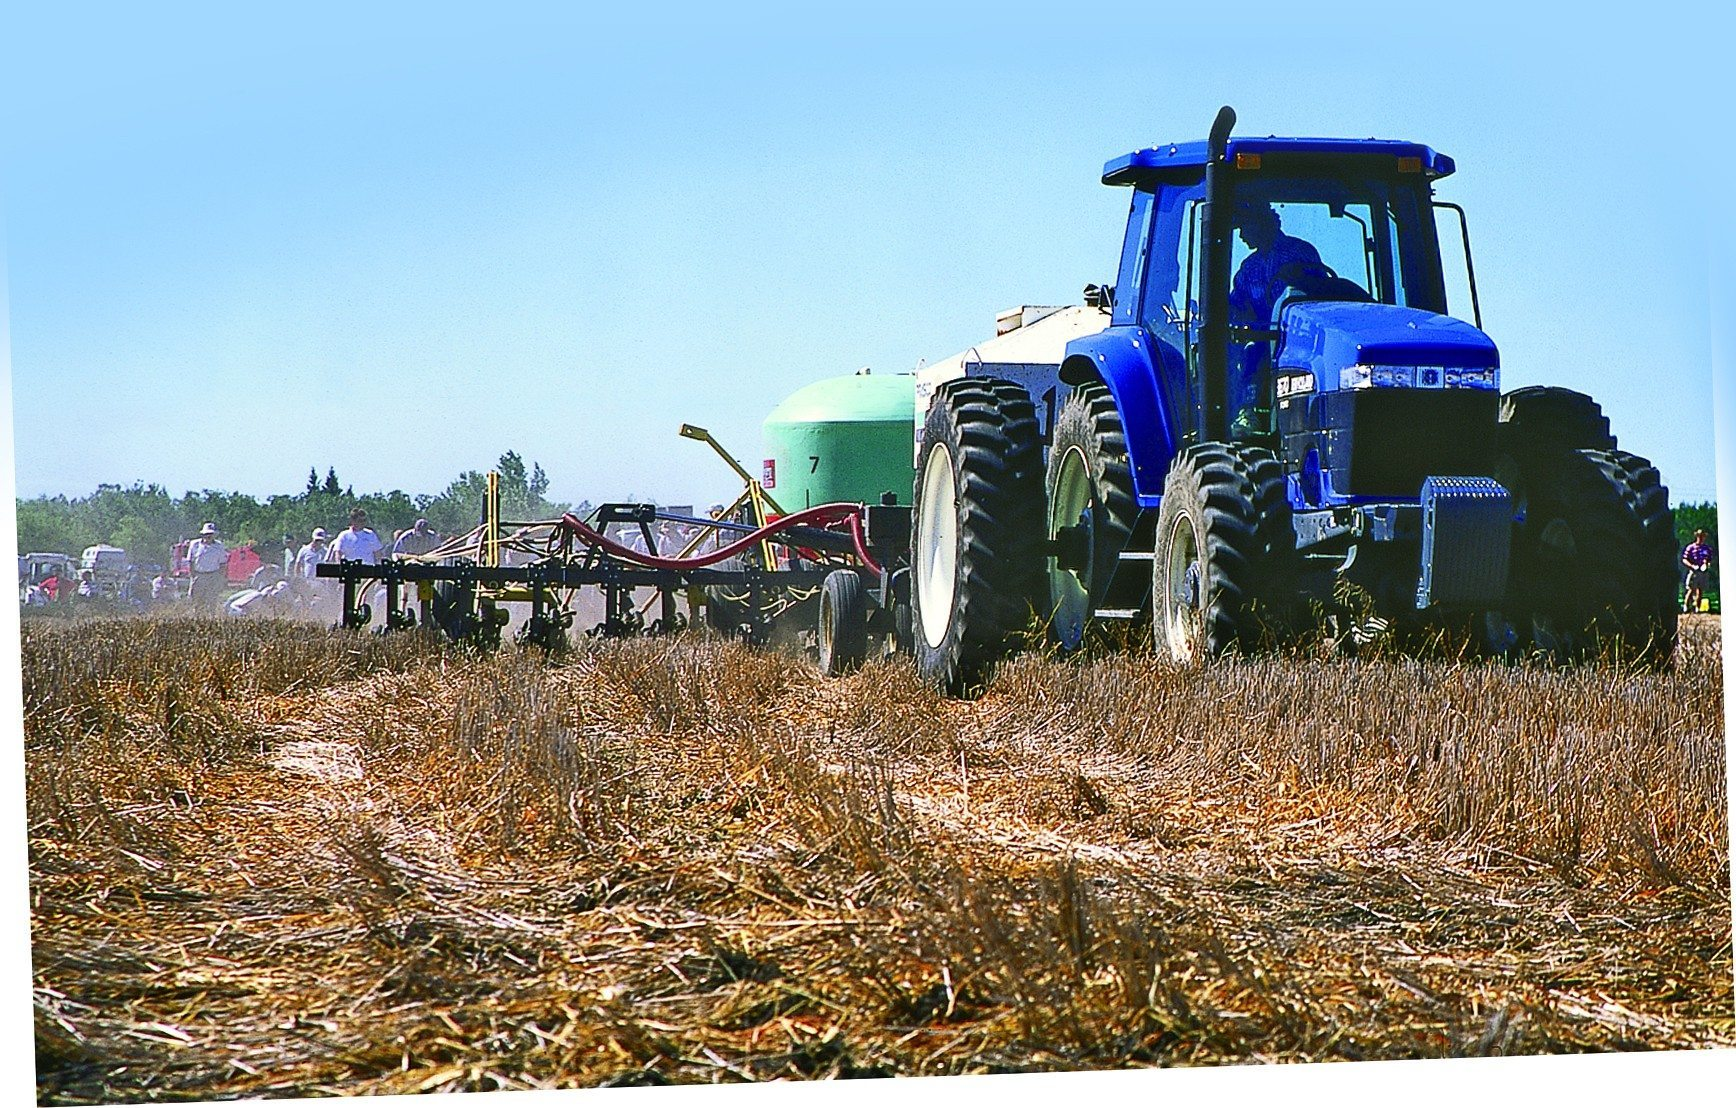 Tractor applying fertilizer to a field.